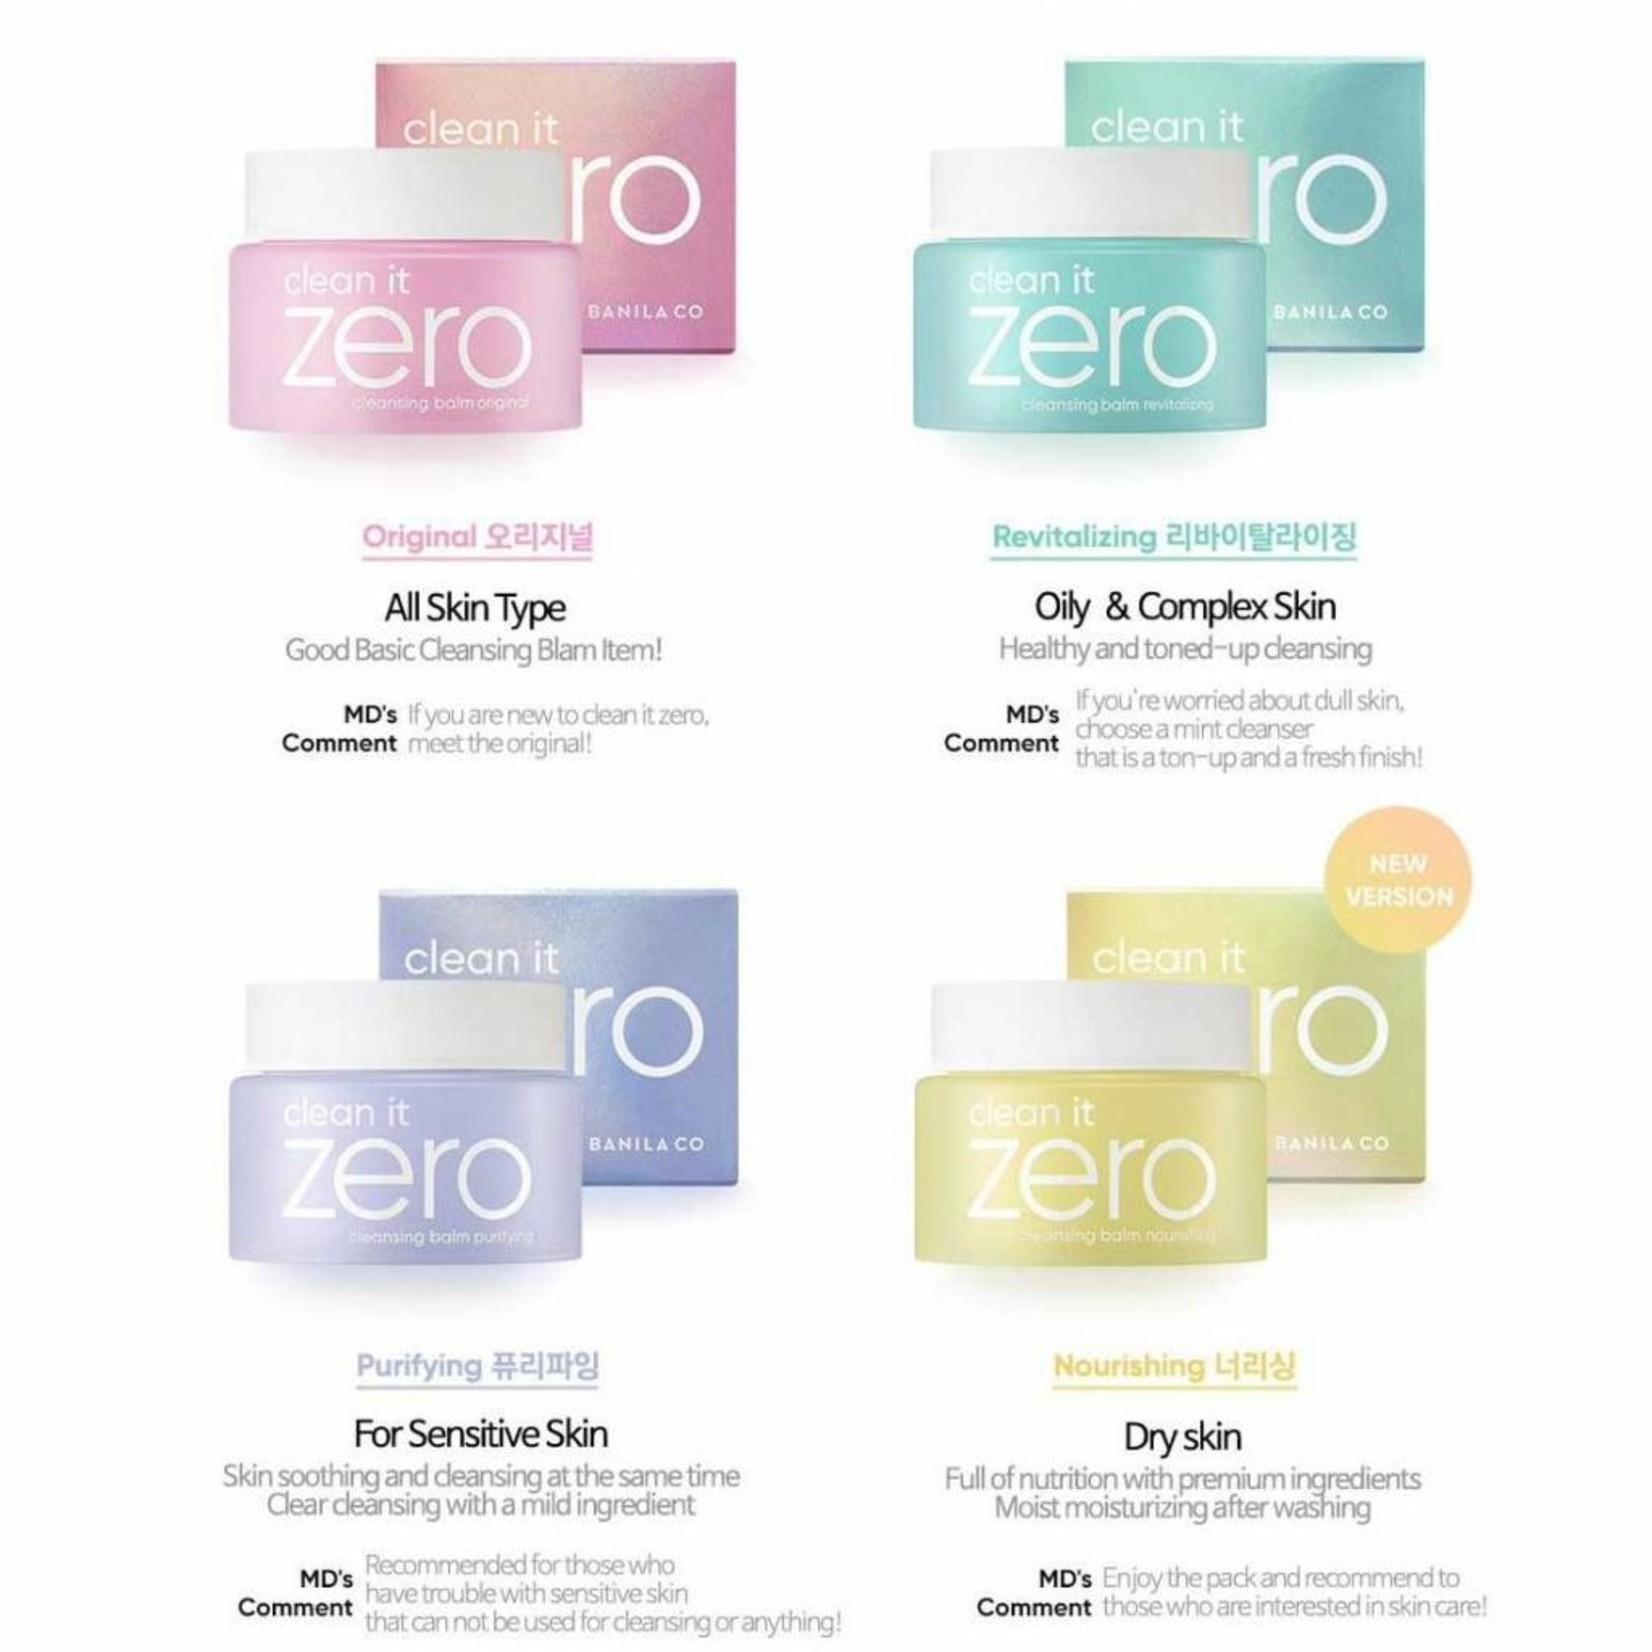 Banila Co Clean It Zero Cleansing Balm Revitalizing